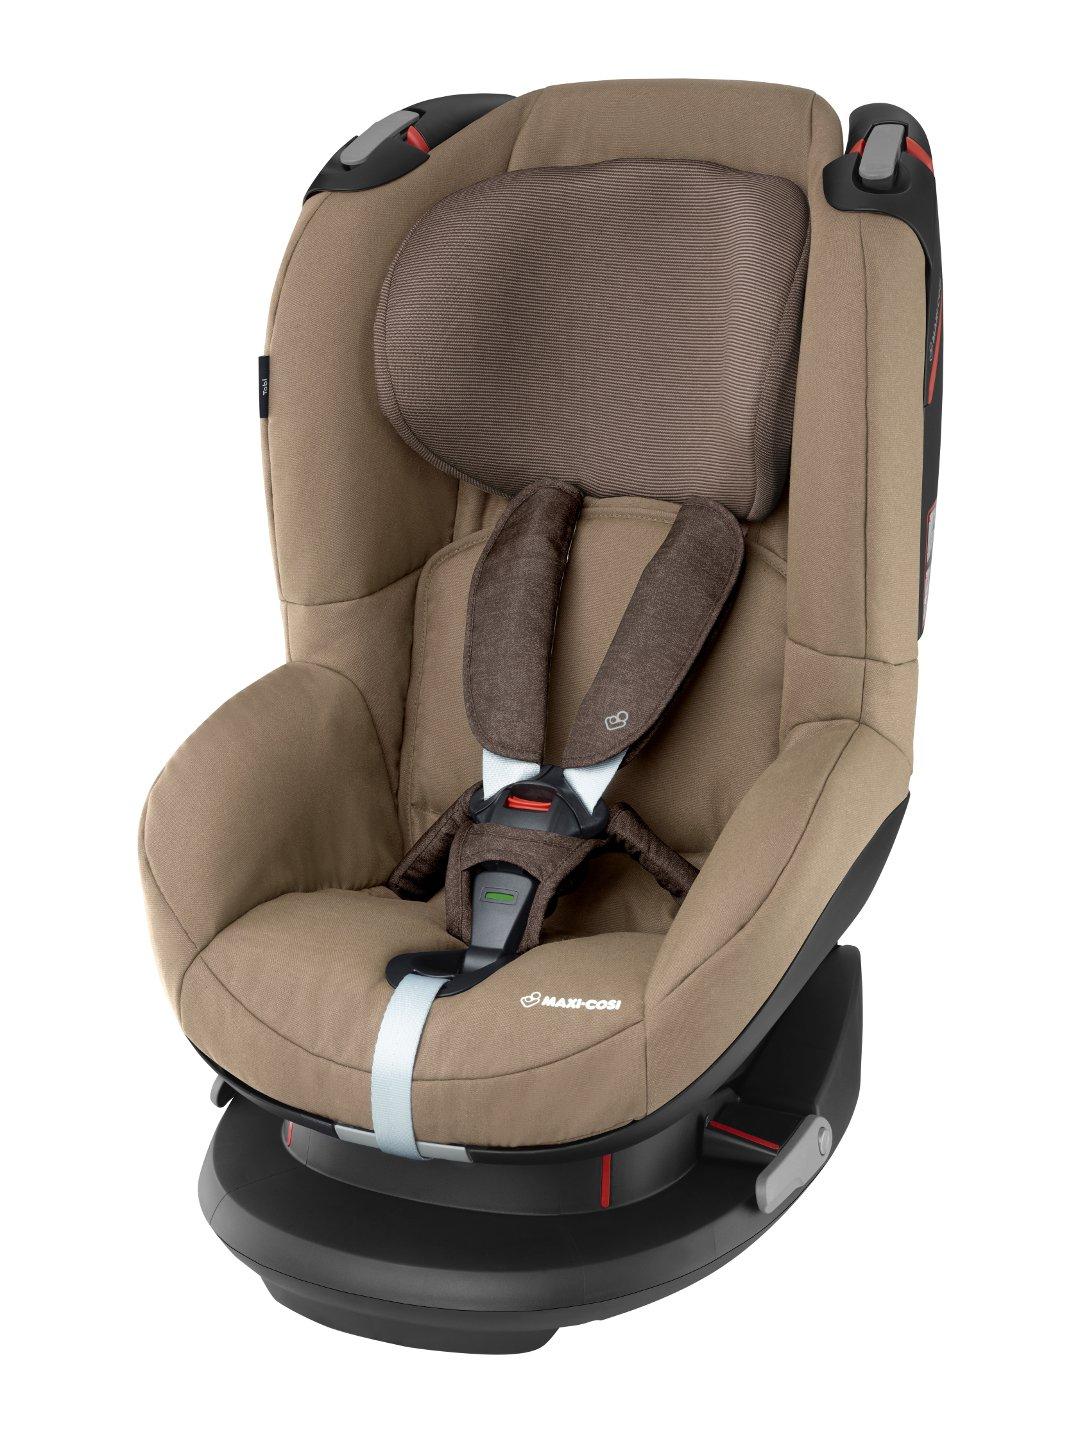 Bērnu autosēdeklis 9-18 kg MAXI-COSI Tobi Nomad Brown